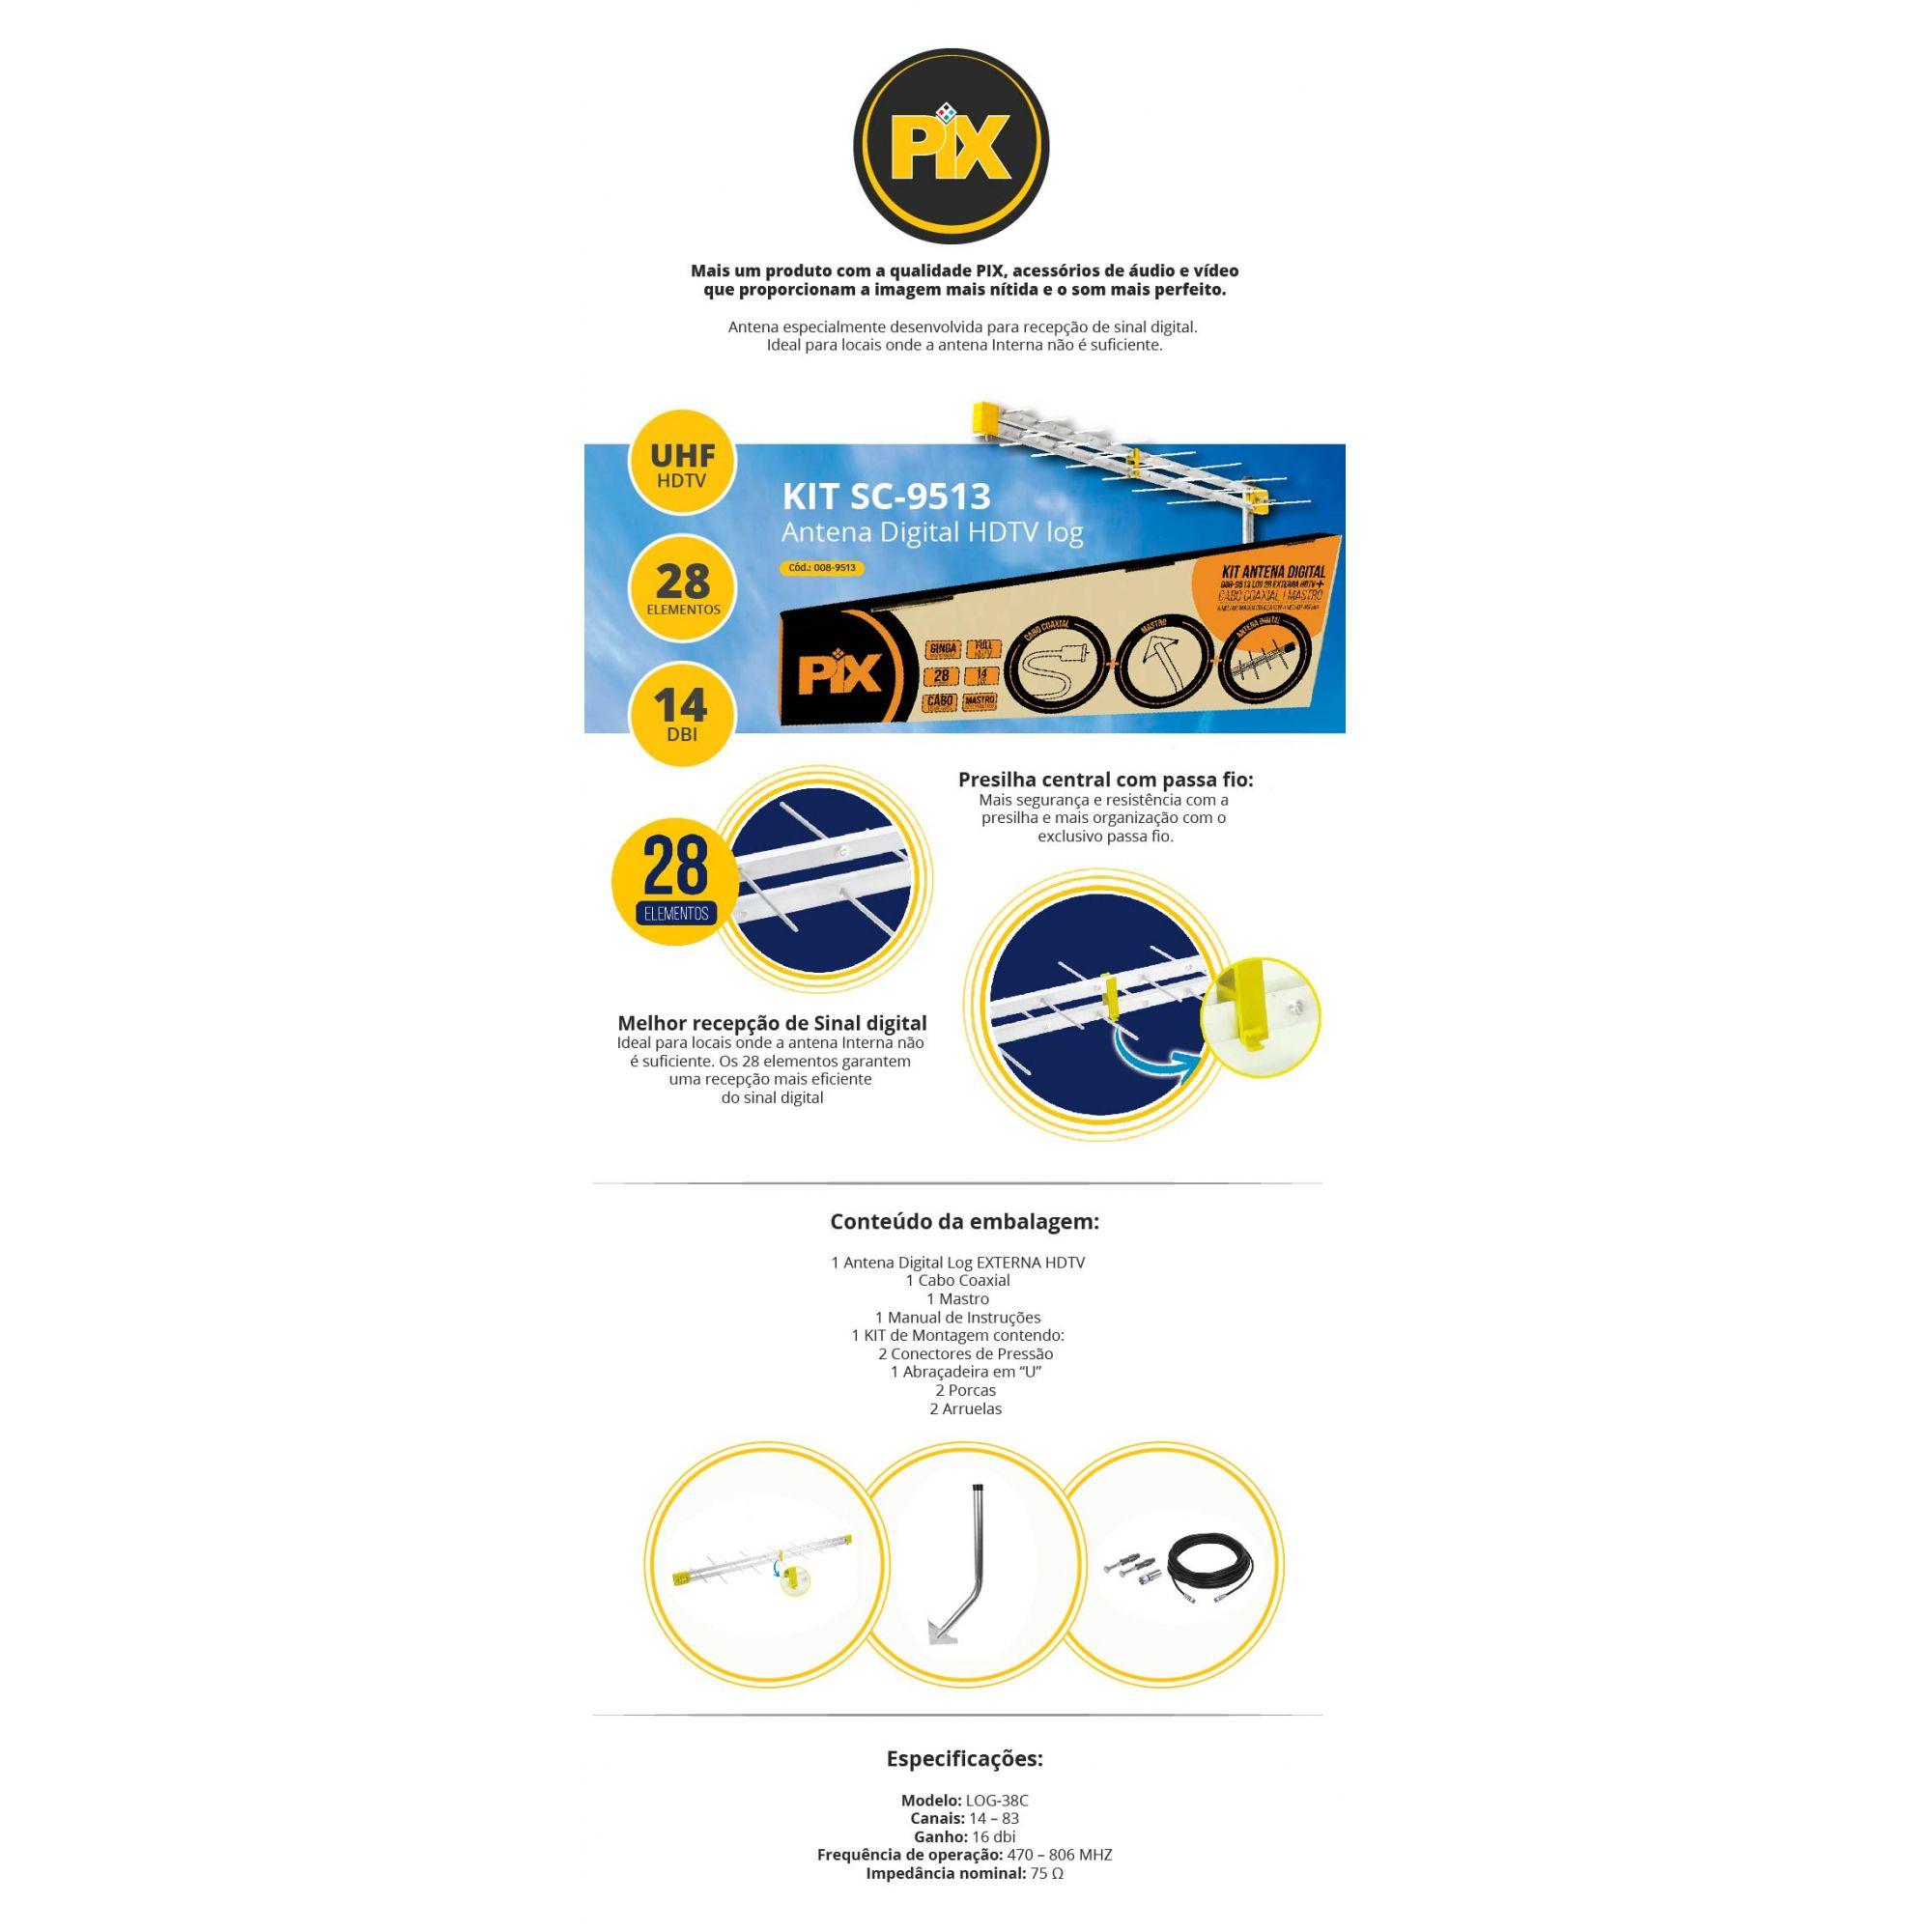 Kit Antena HDTV LOG 28 Elementos + Matro / Cabo / Conectores Pix  - Eletroinfocia